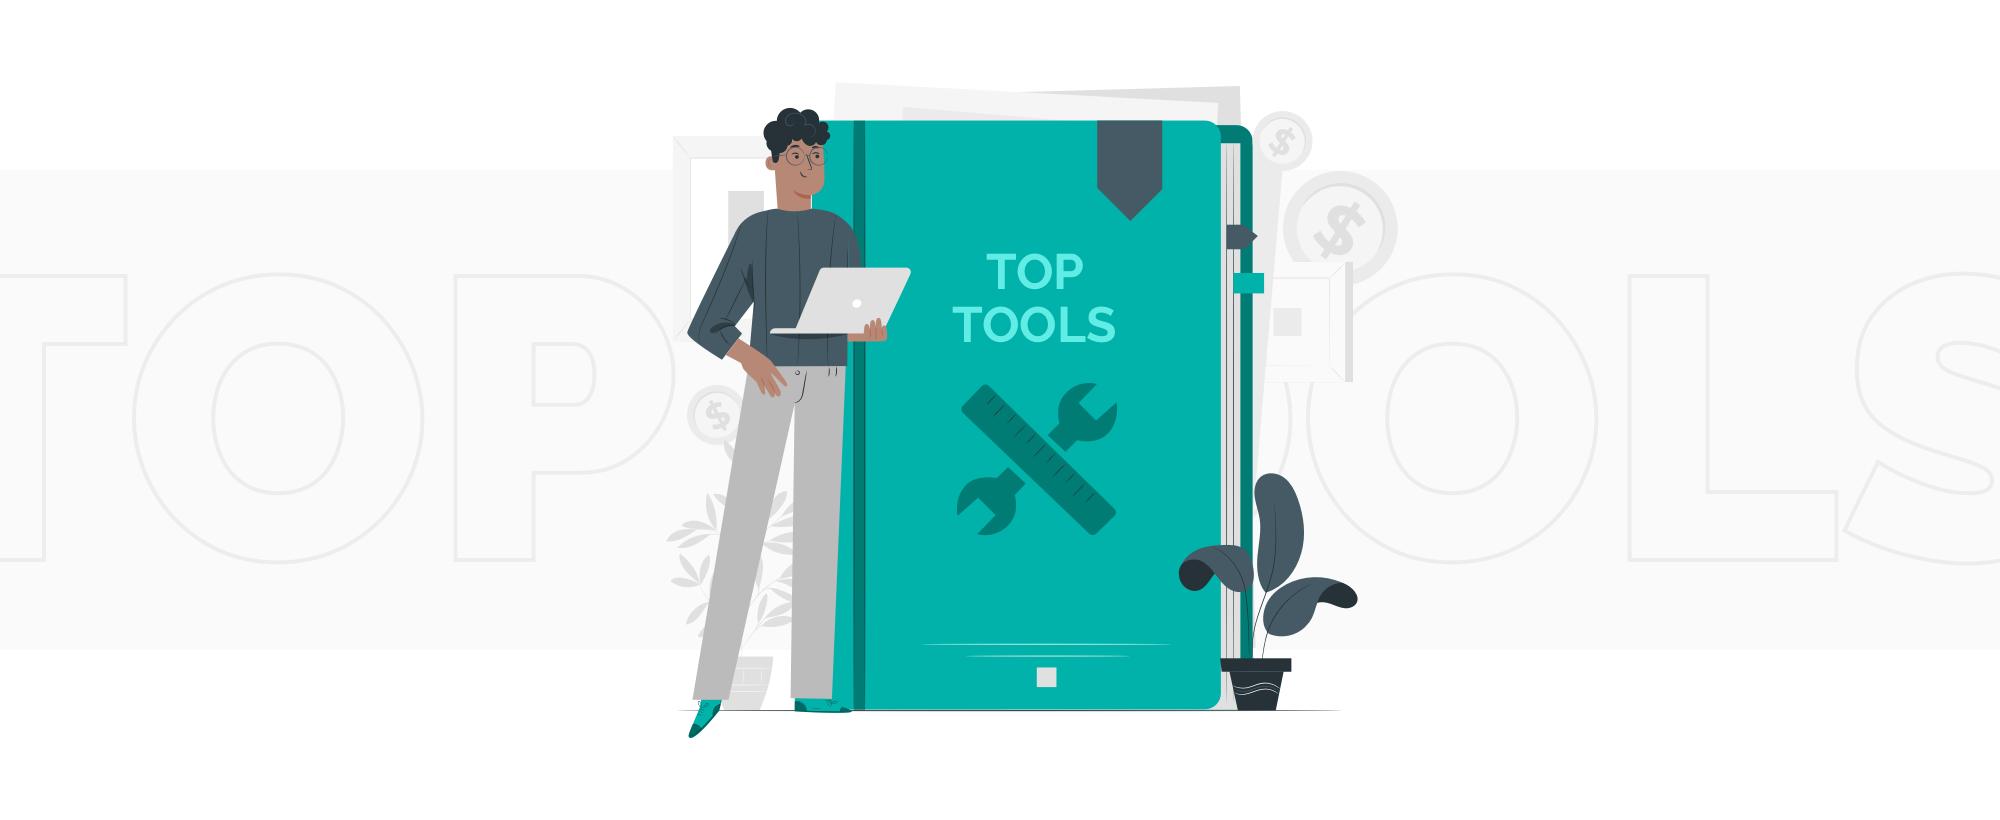 TOP 15 Human Resources Management Tools | TechMagic.co